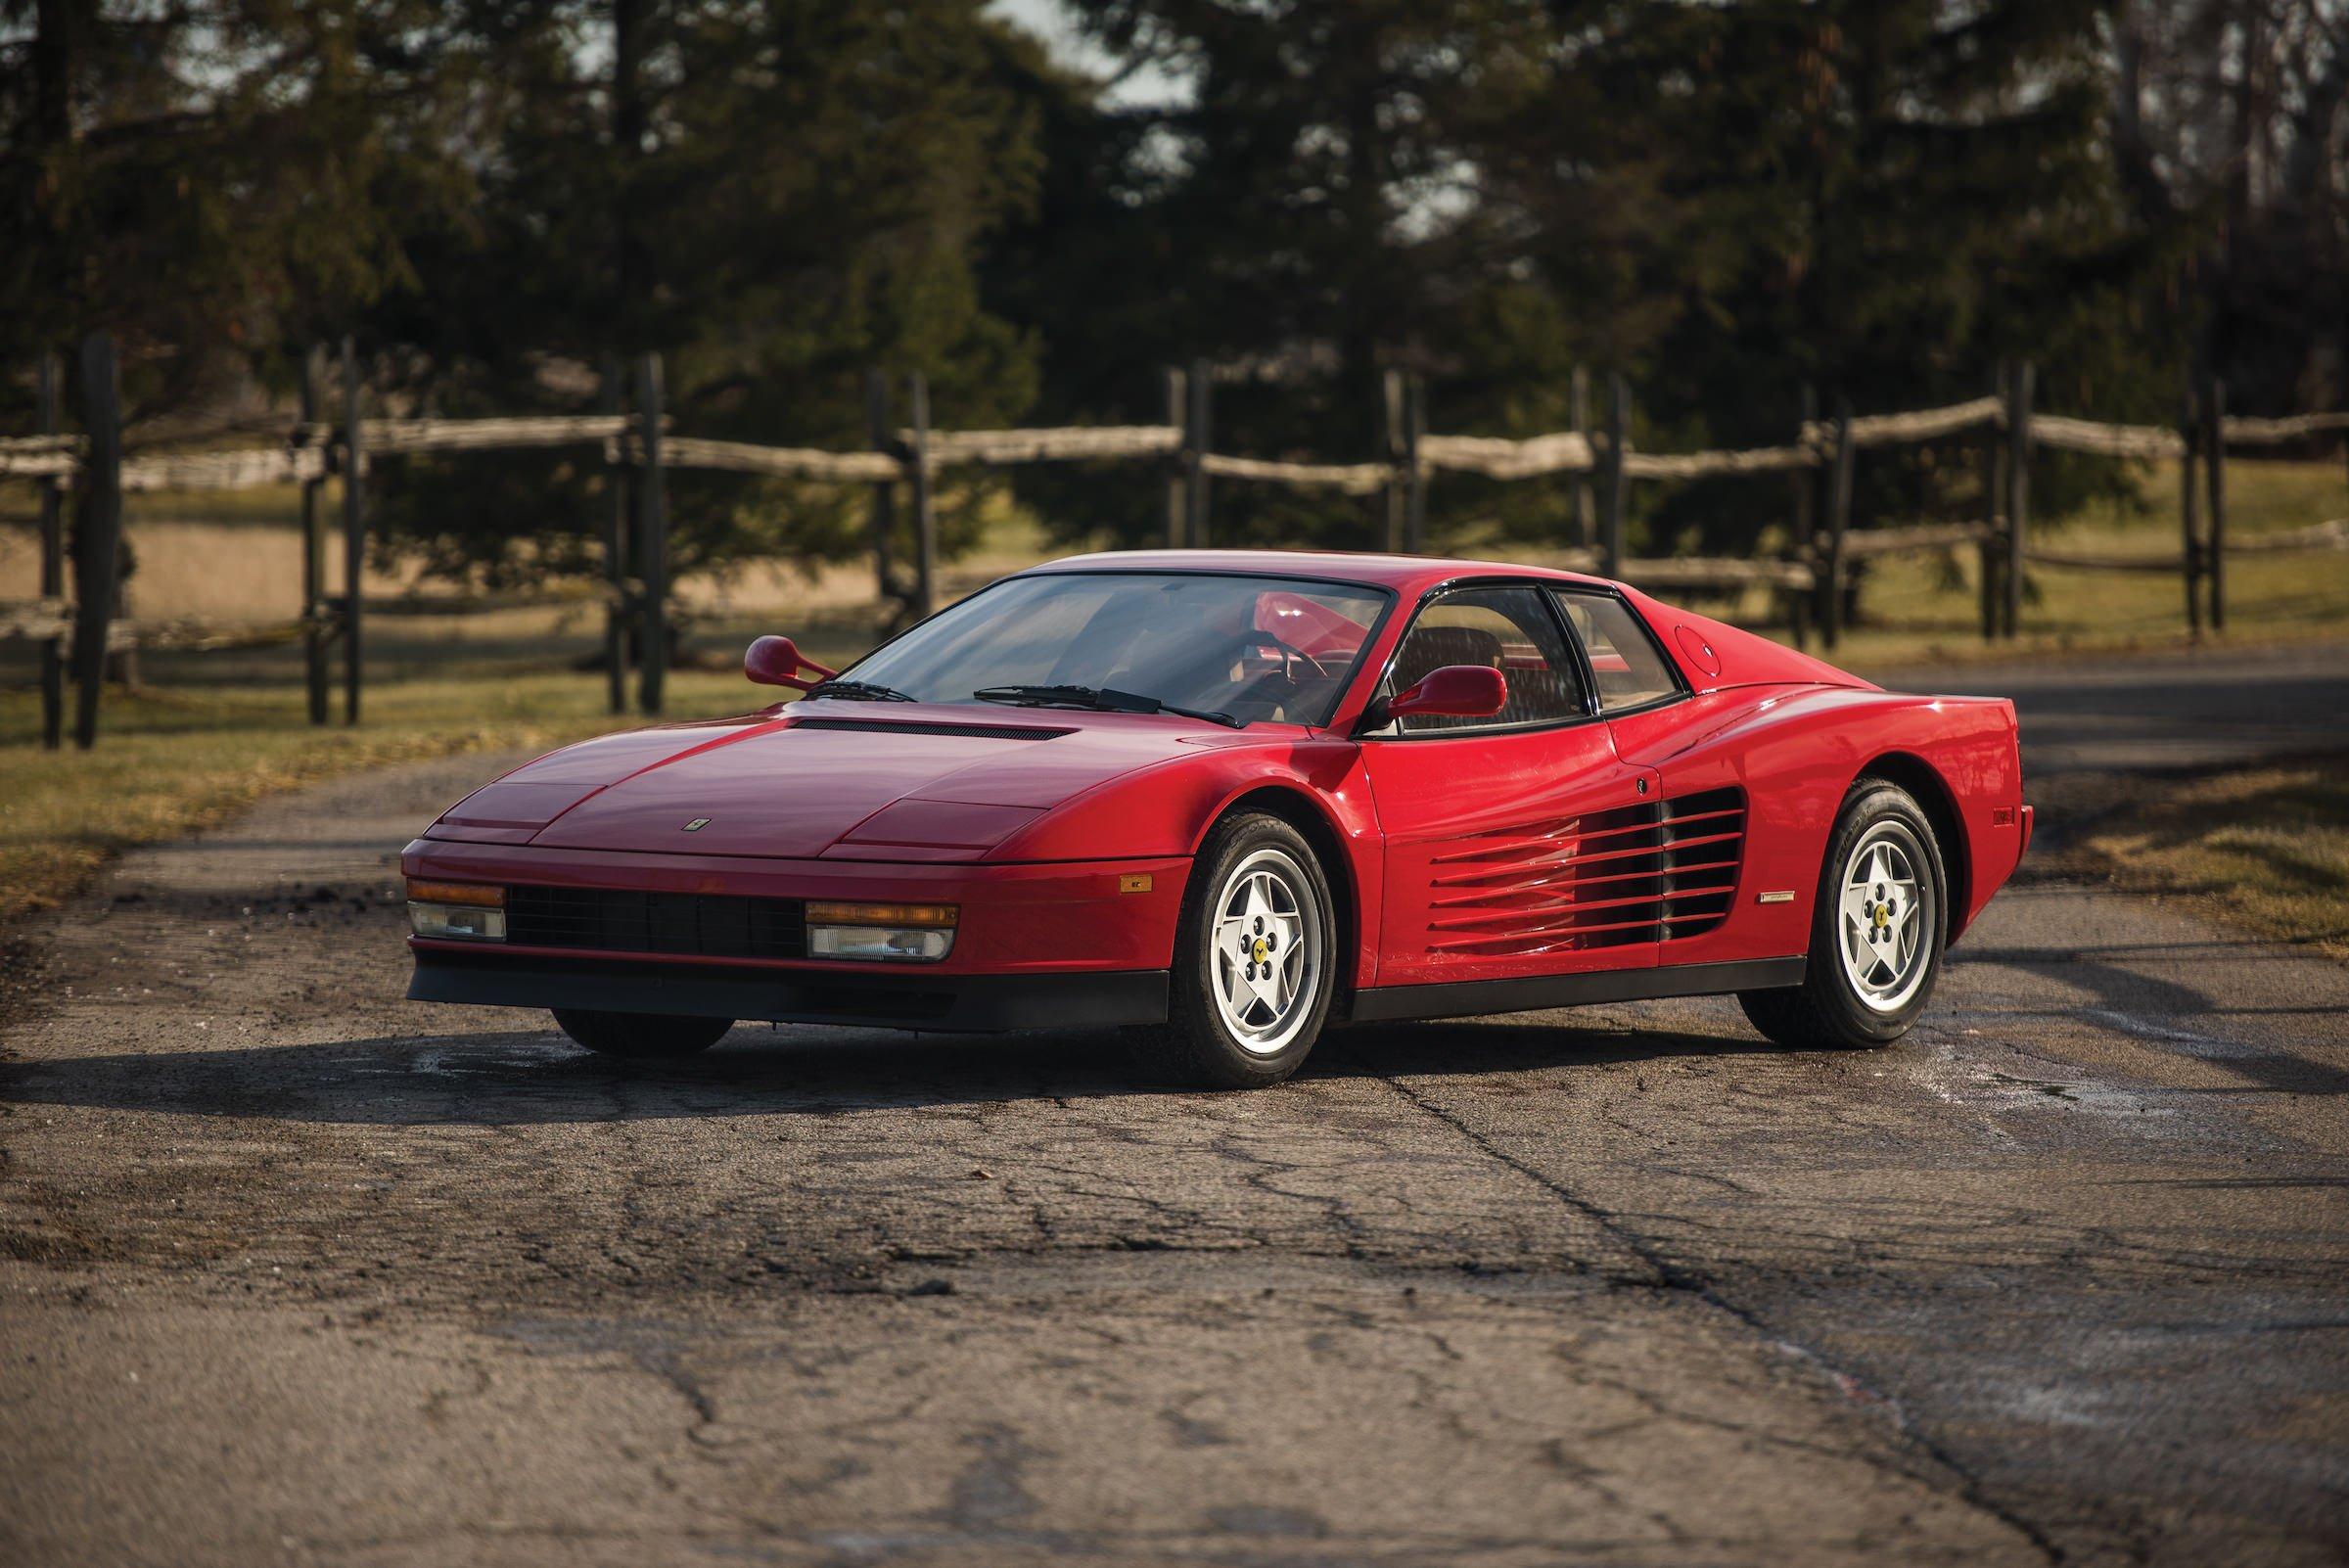 The Ferrari Testarossa Iconic 1980s Supercar Royalty